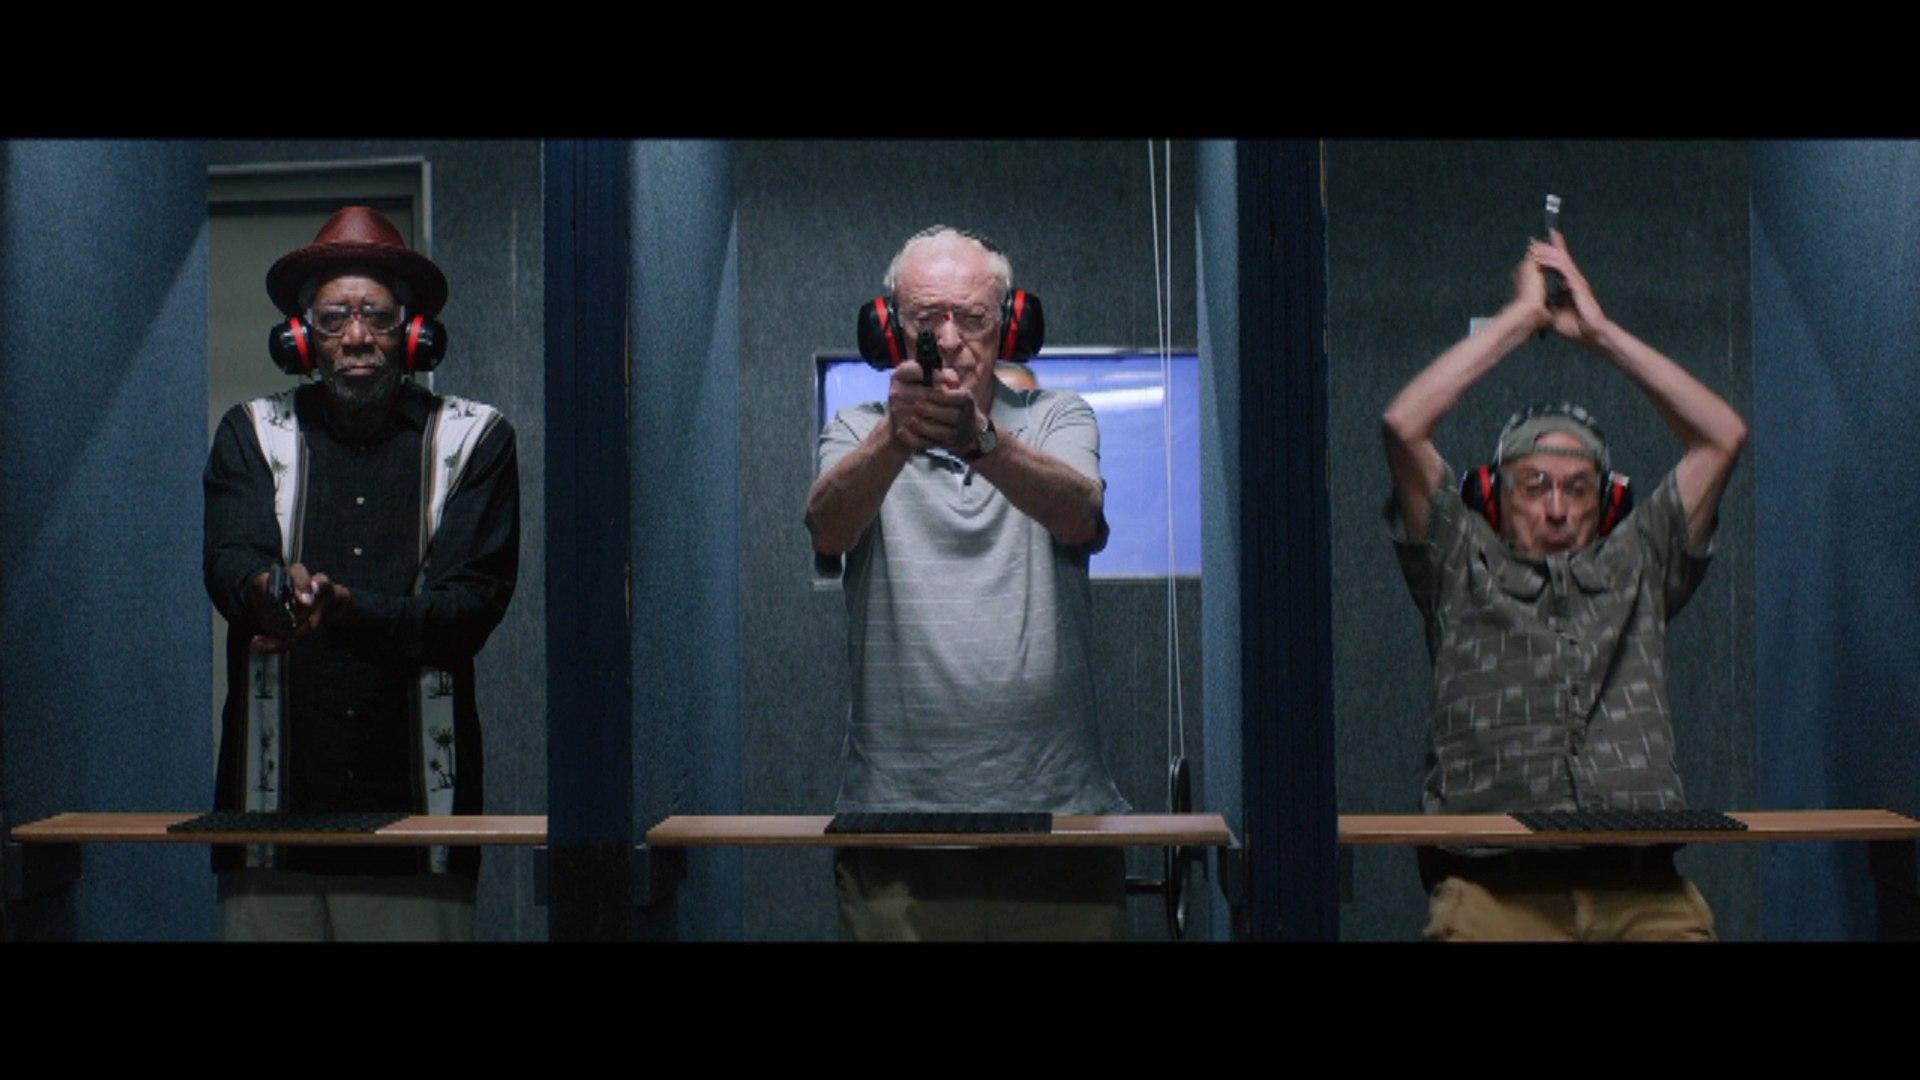 Morgan Freeman, Alan Arkin, Michael Caine In 'Going In Style' Trailer 1